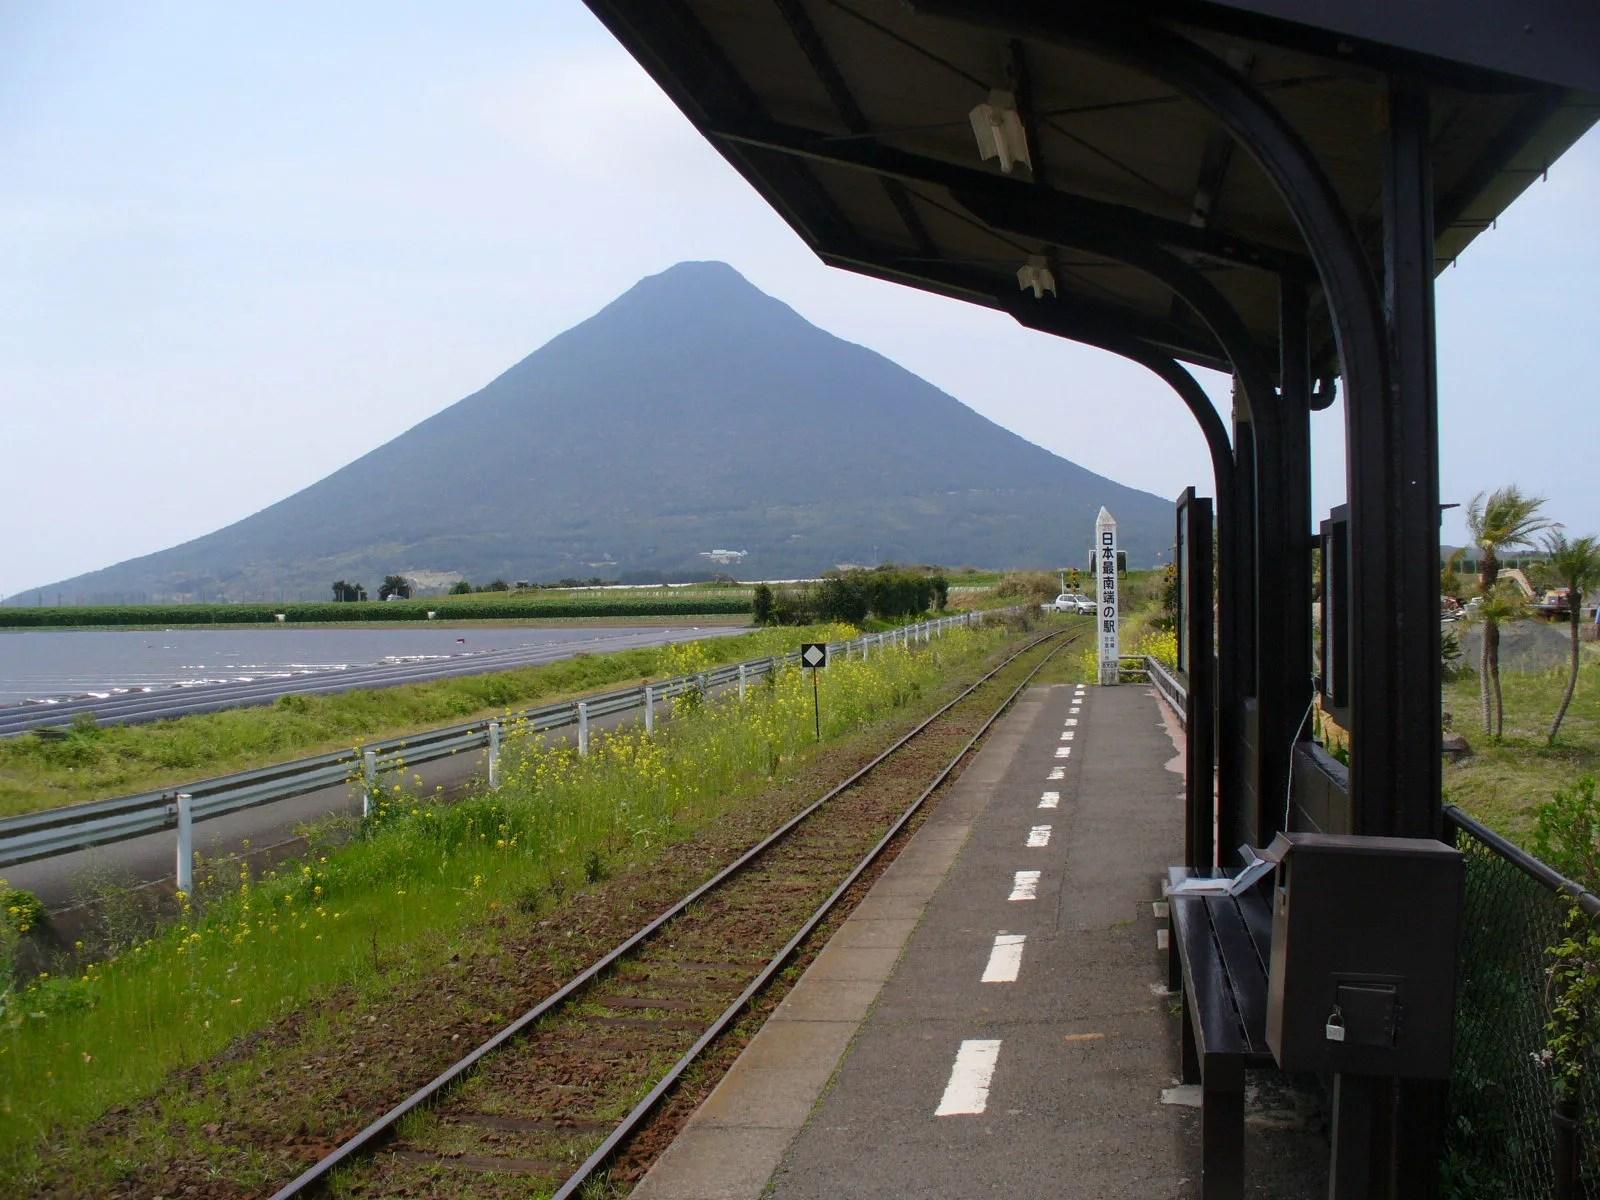 JR日本最南端の駅(指宿枕崎線・西大山駅) - 鉄道の旅 ...